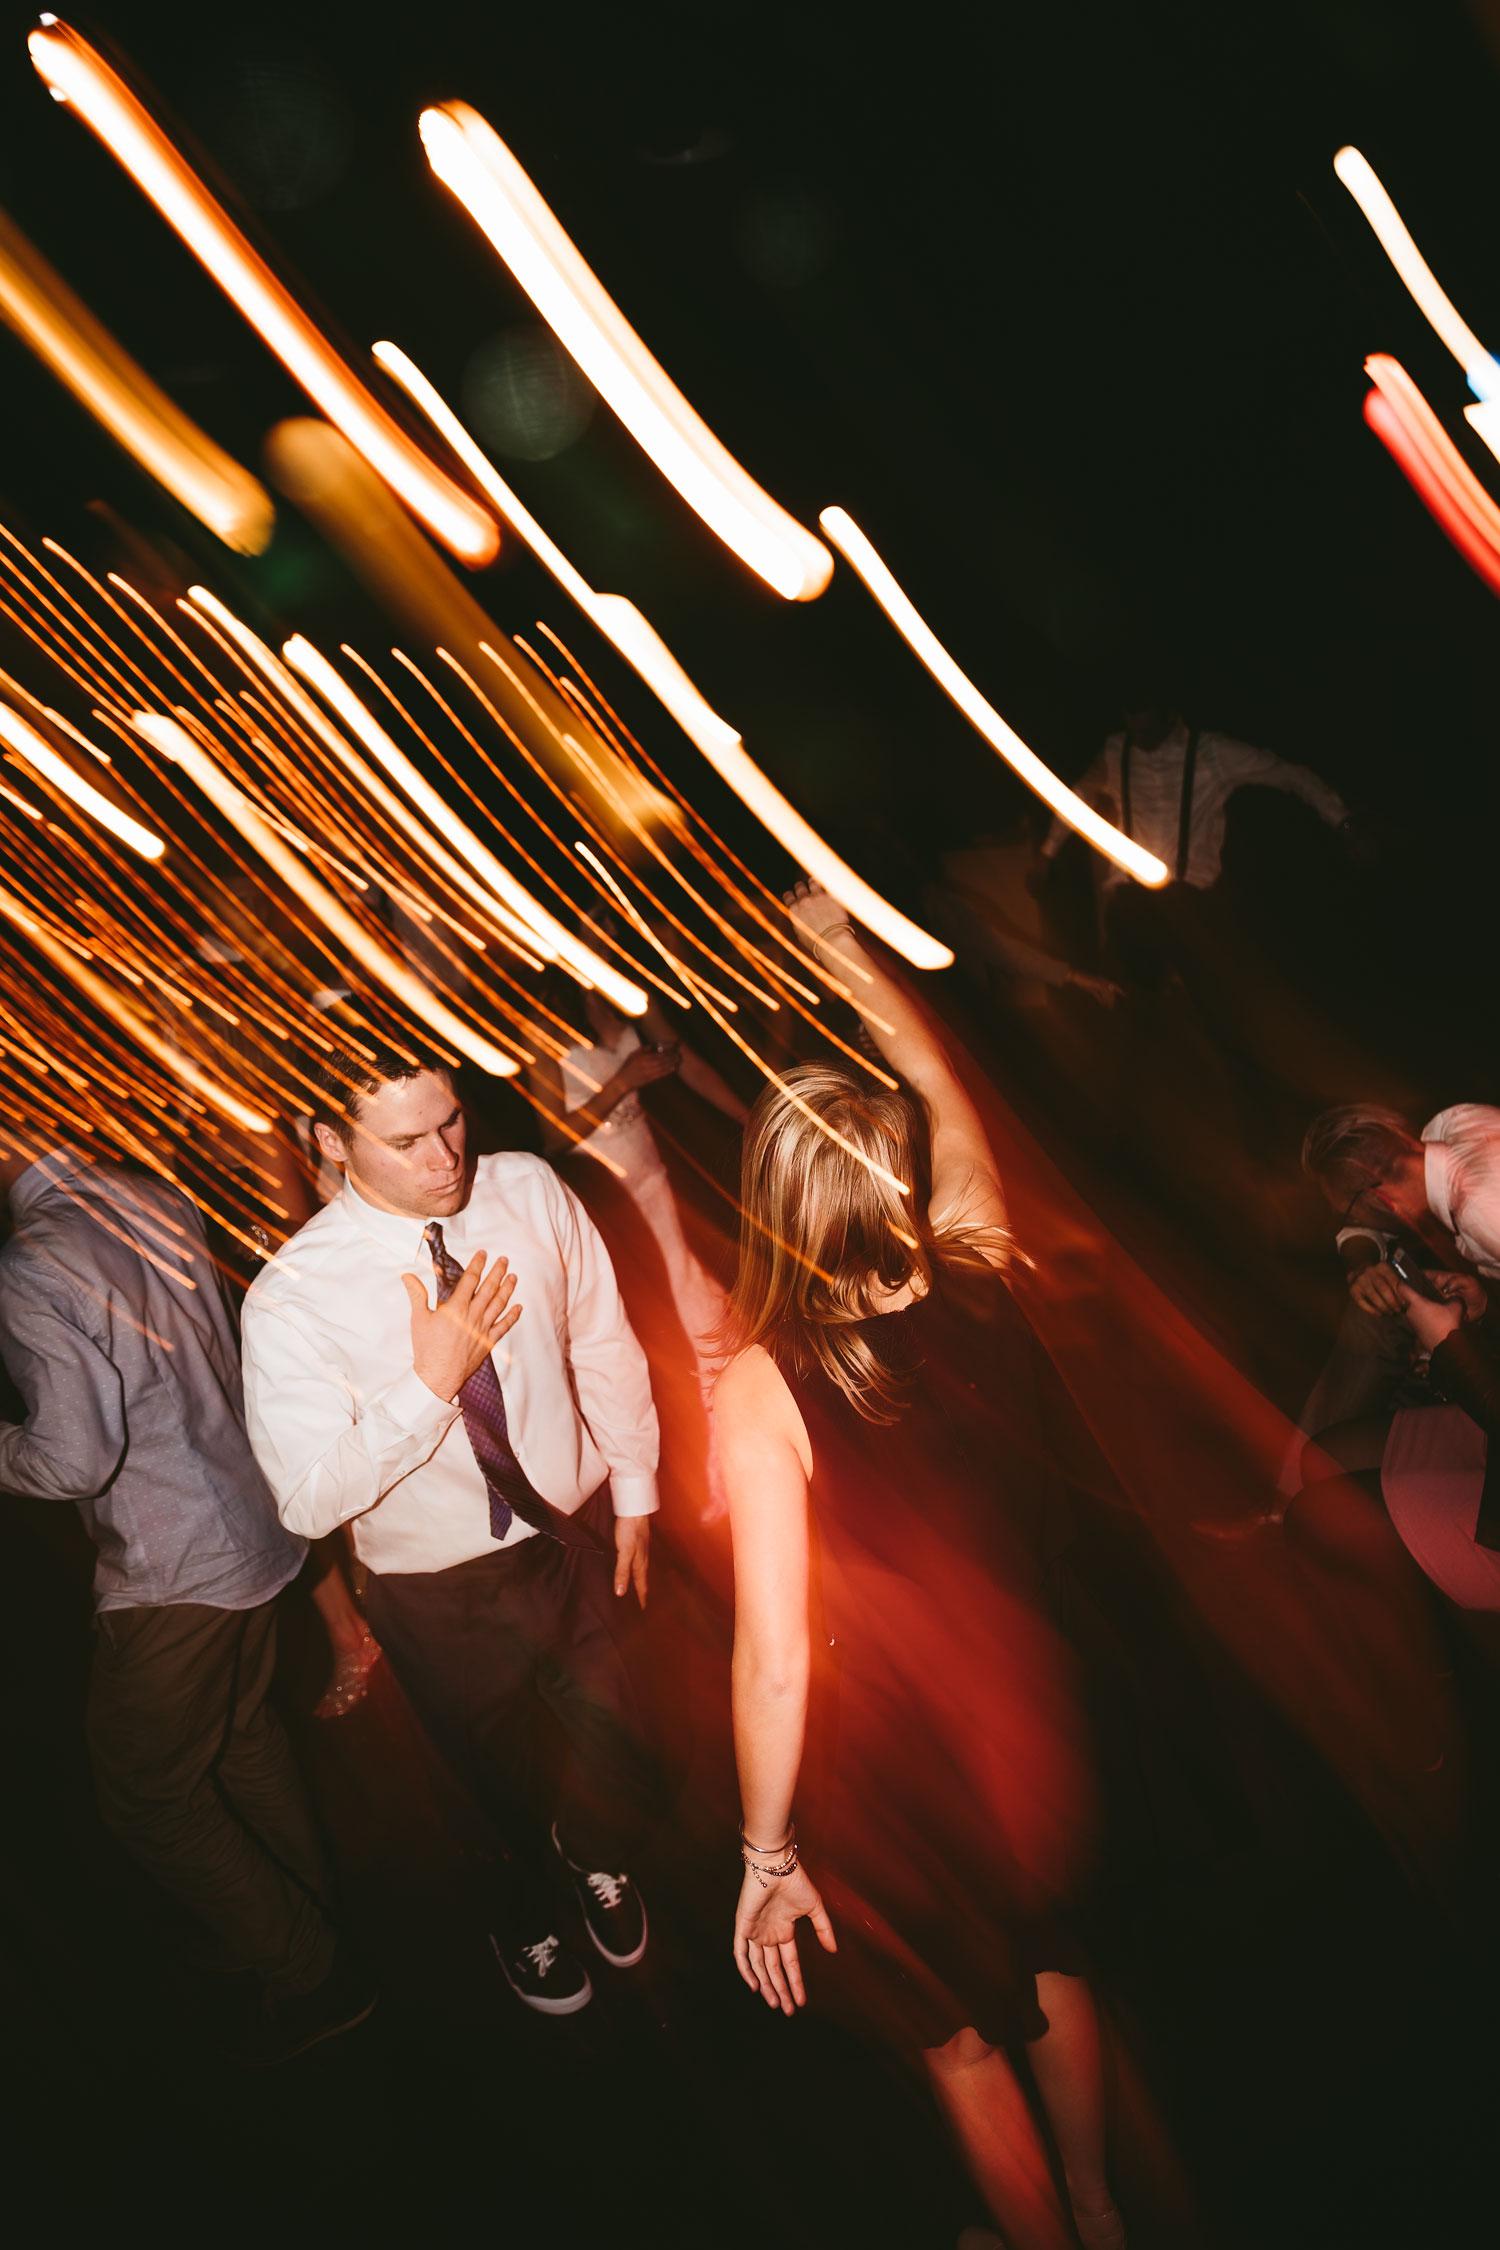 cleveland-wedding-photographers-cuyahoga-valley-national-park-happy-days-lodge-105.jpg